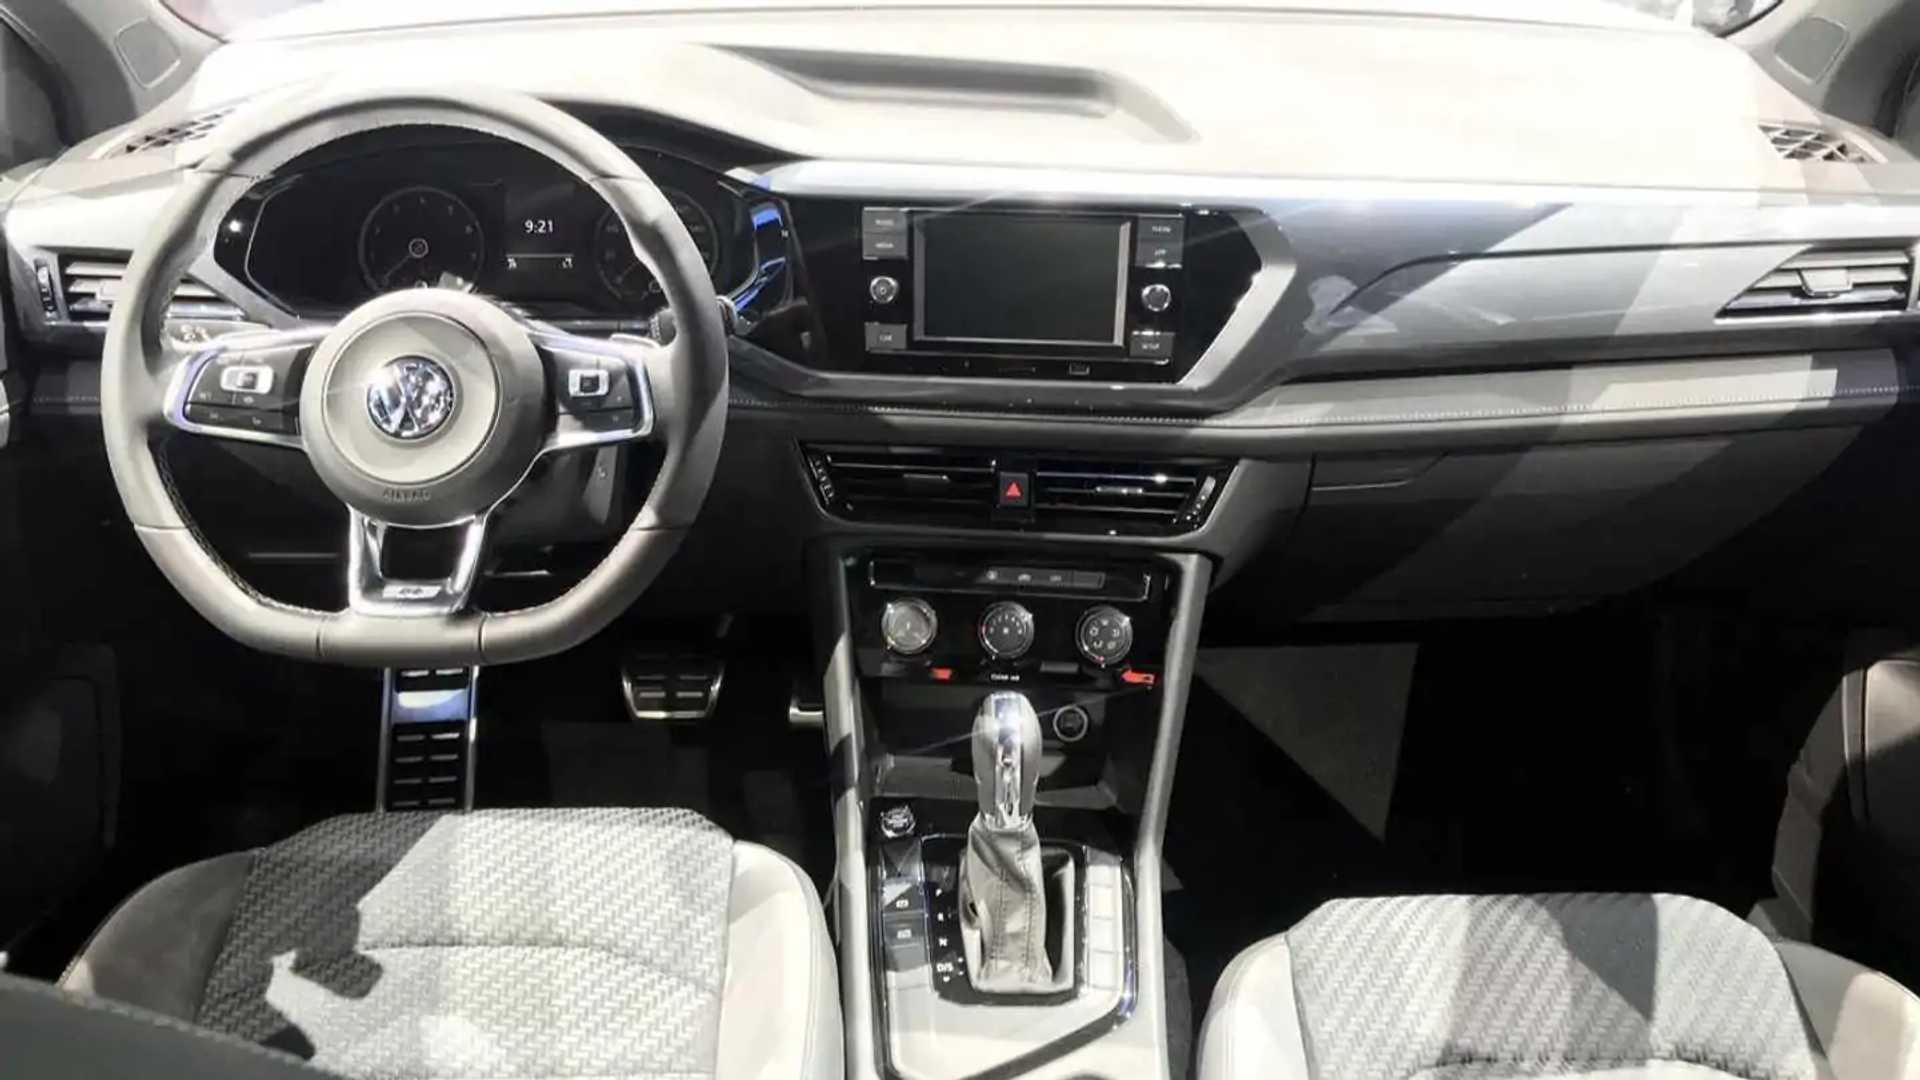 Volkswagen Tarek estreia na China e chega ao Brasil em 2020 Volkswagen-tarek-salao-de-guangzhou-china